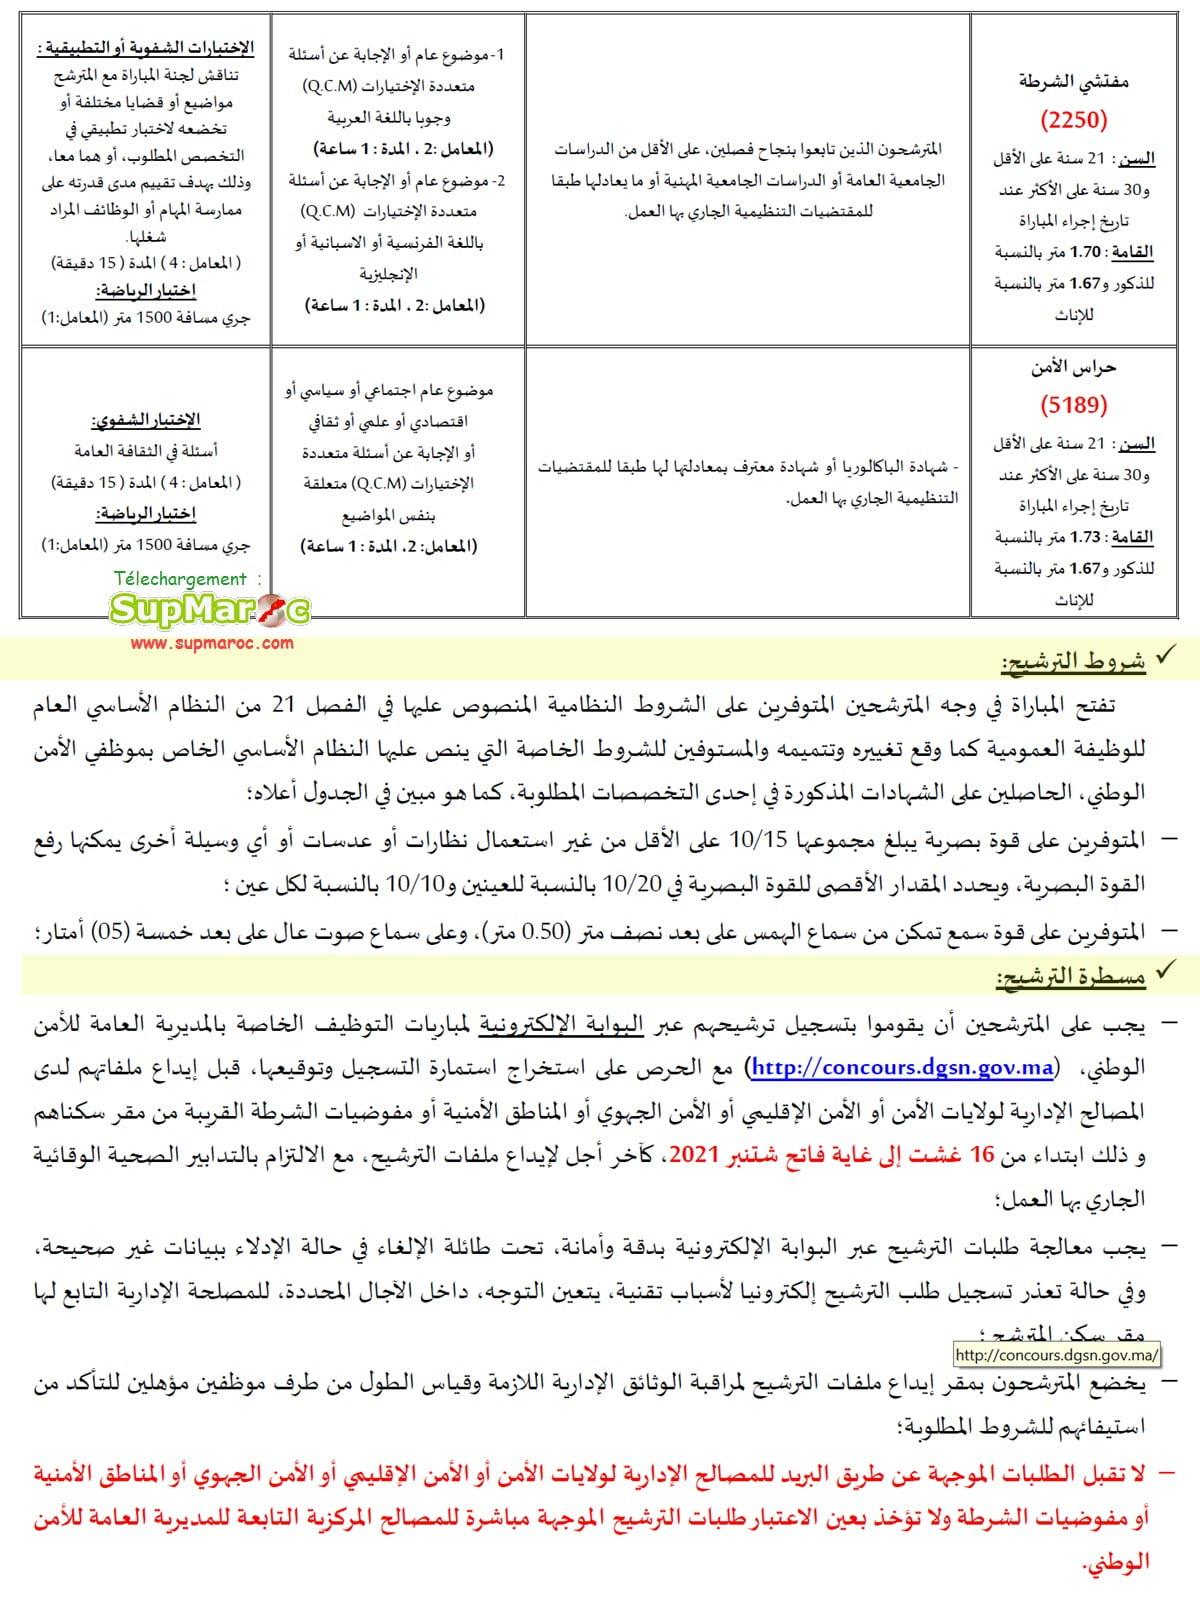 Concours Recrutement 8119 police Maroc dgsn 2021